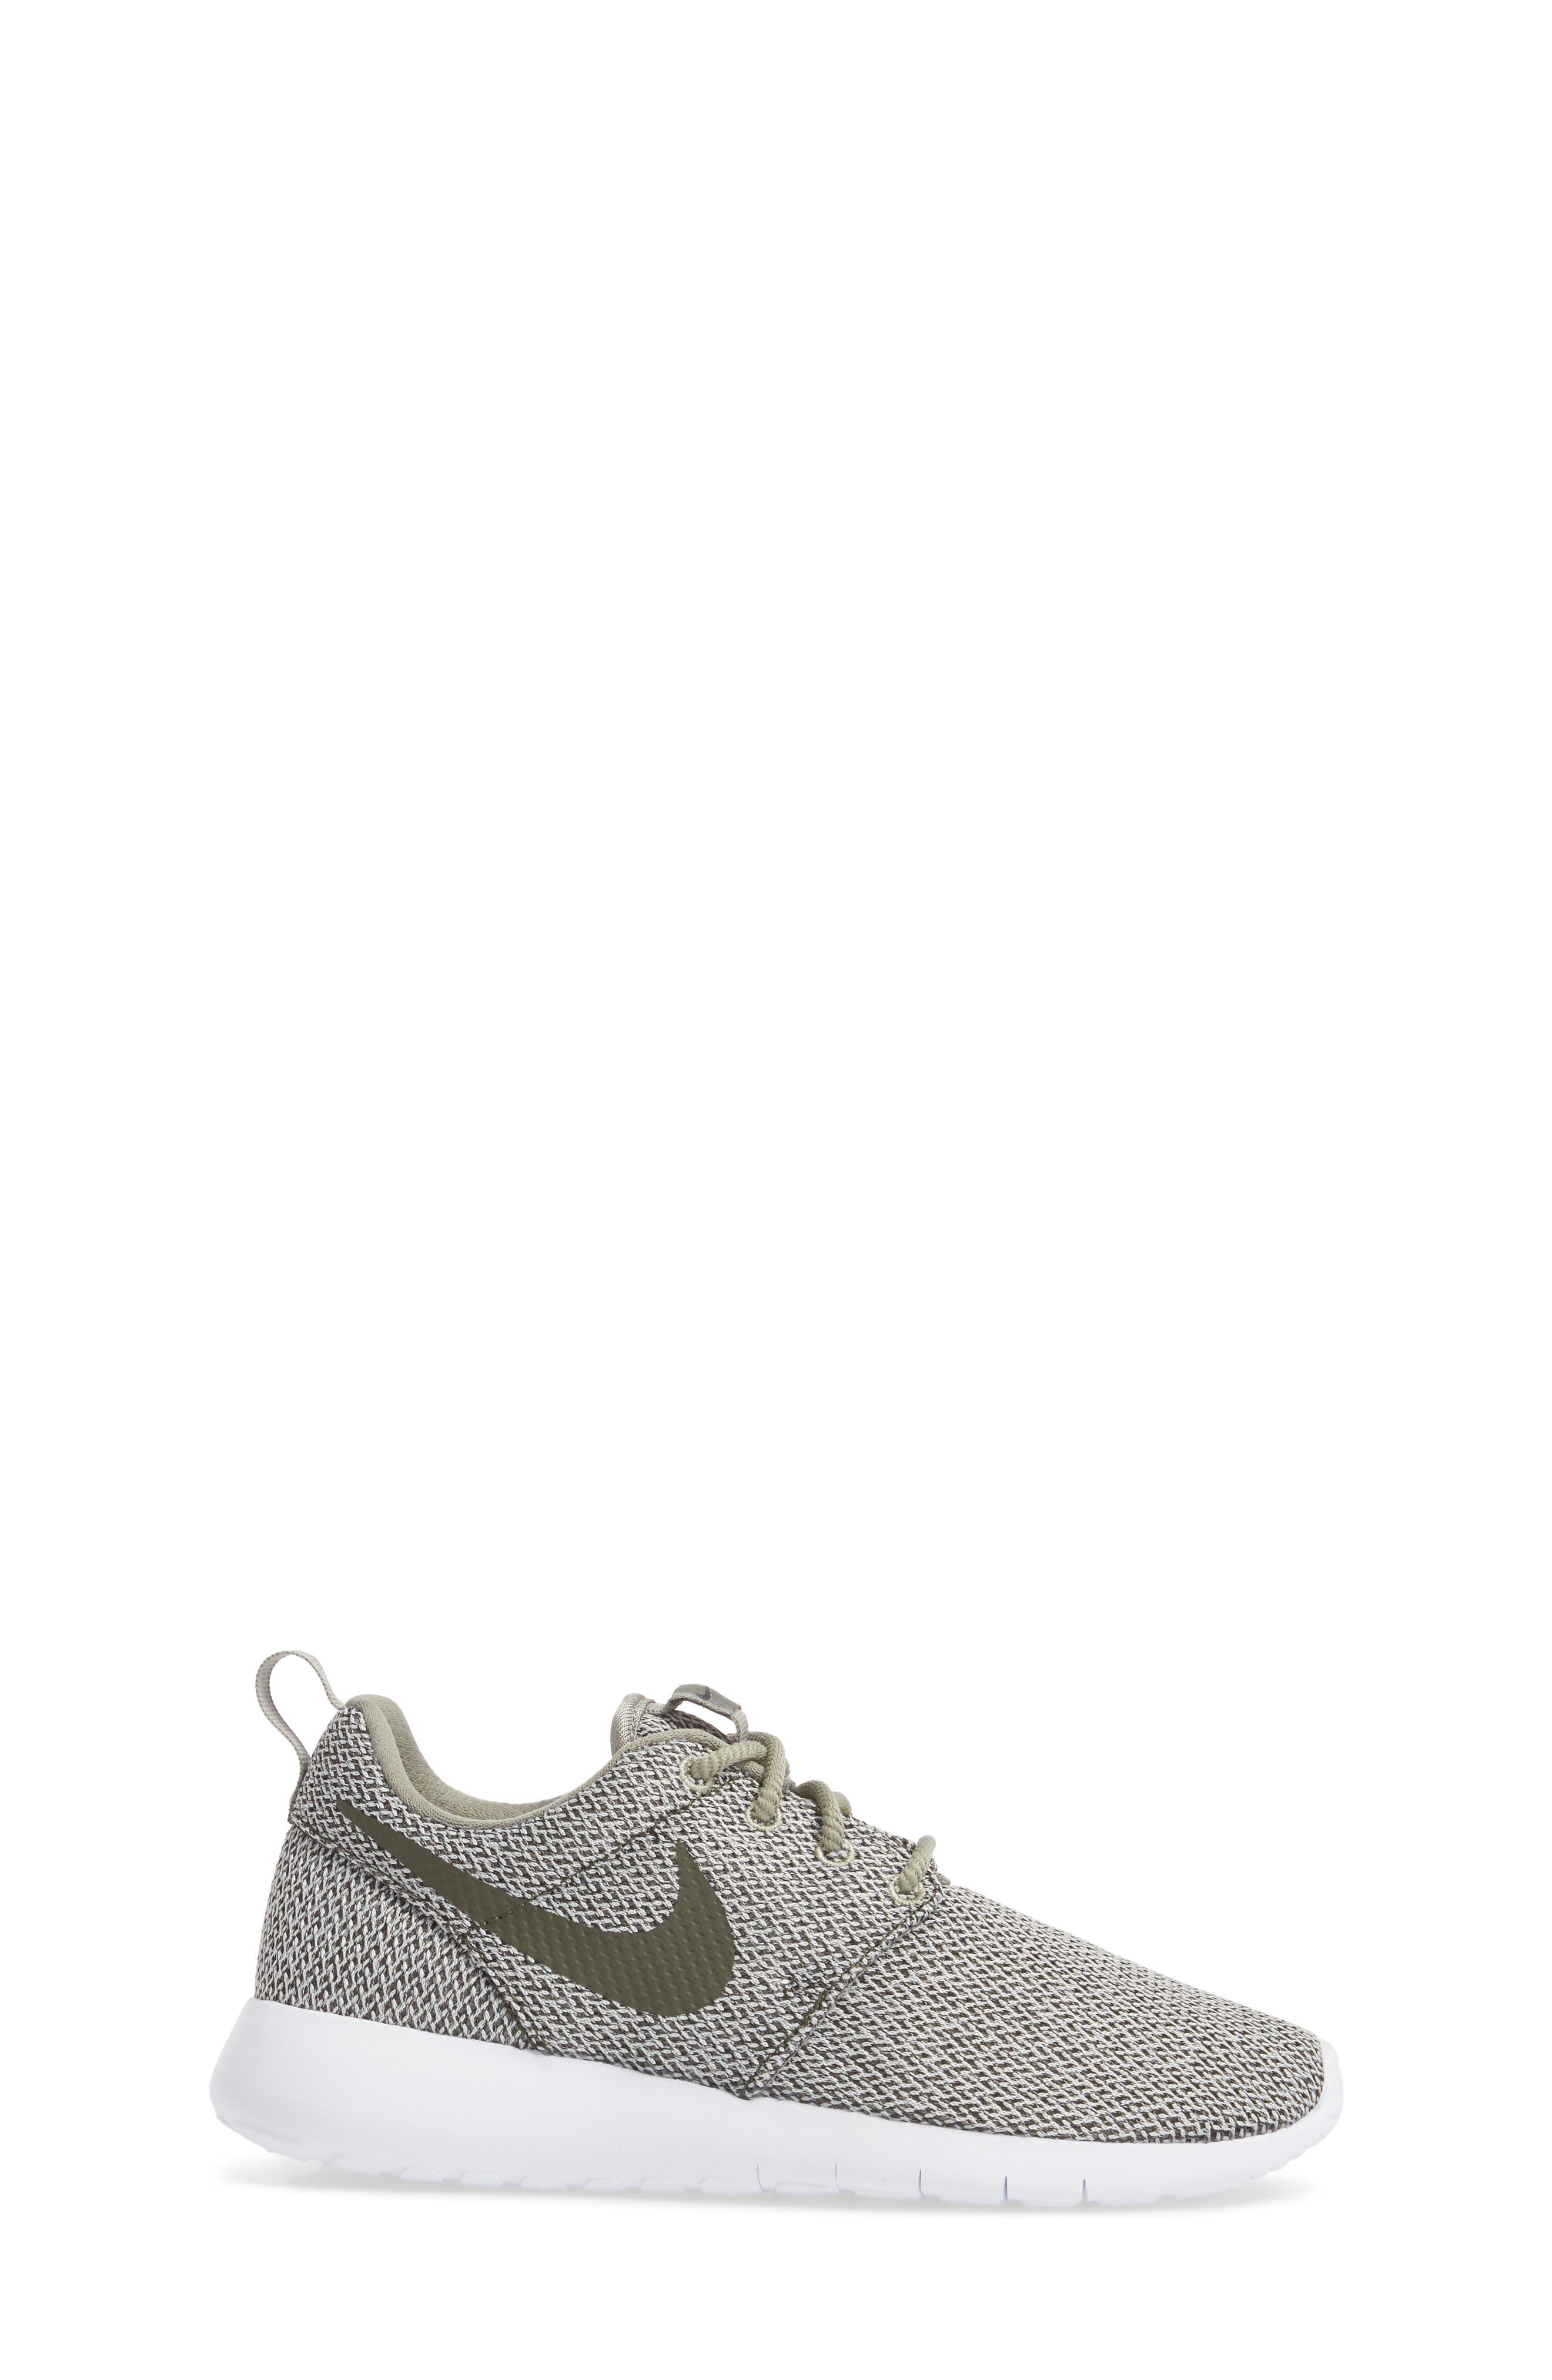 'Roshe Run' Sneaker,                             Alternate thumbnail 3, color,                             Dark Stucco/ Sequoia/ Bone